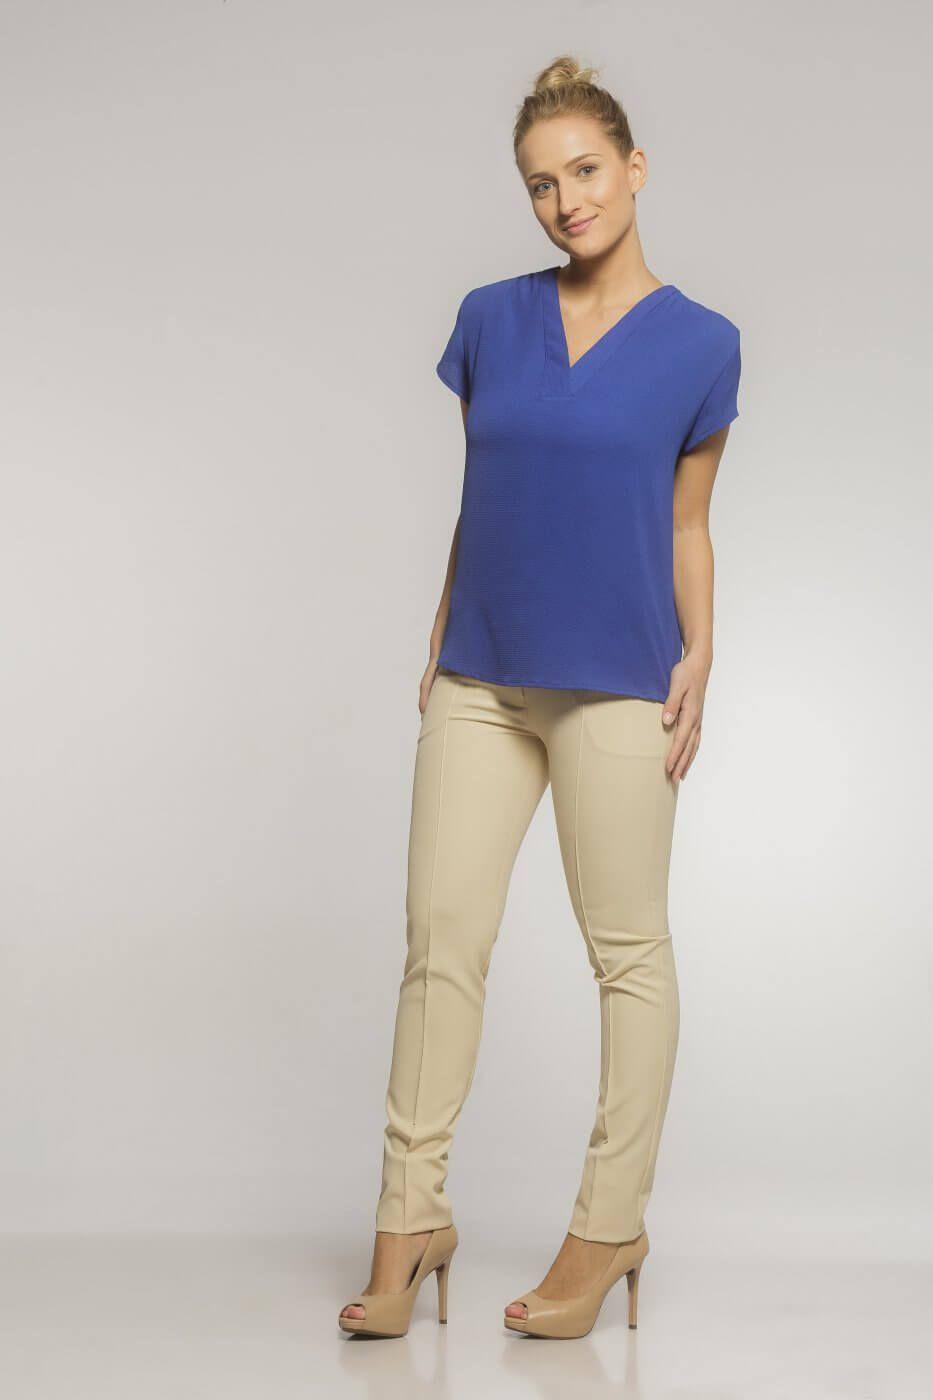 Camisa Gola V Blooms Crepe Marrocos (Kit com 3)